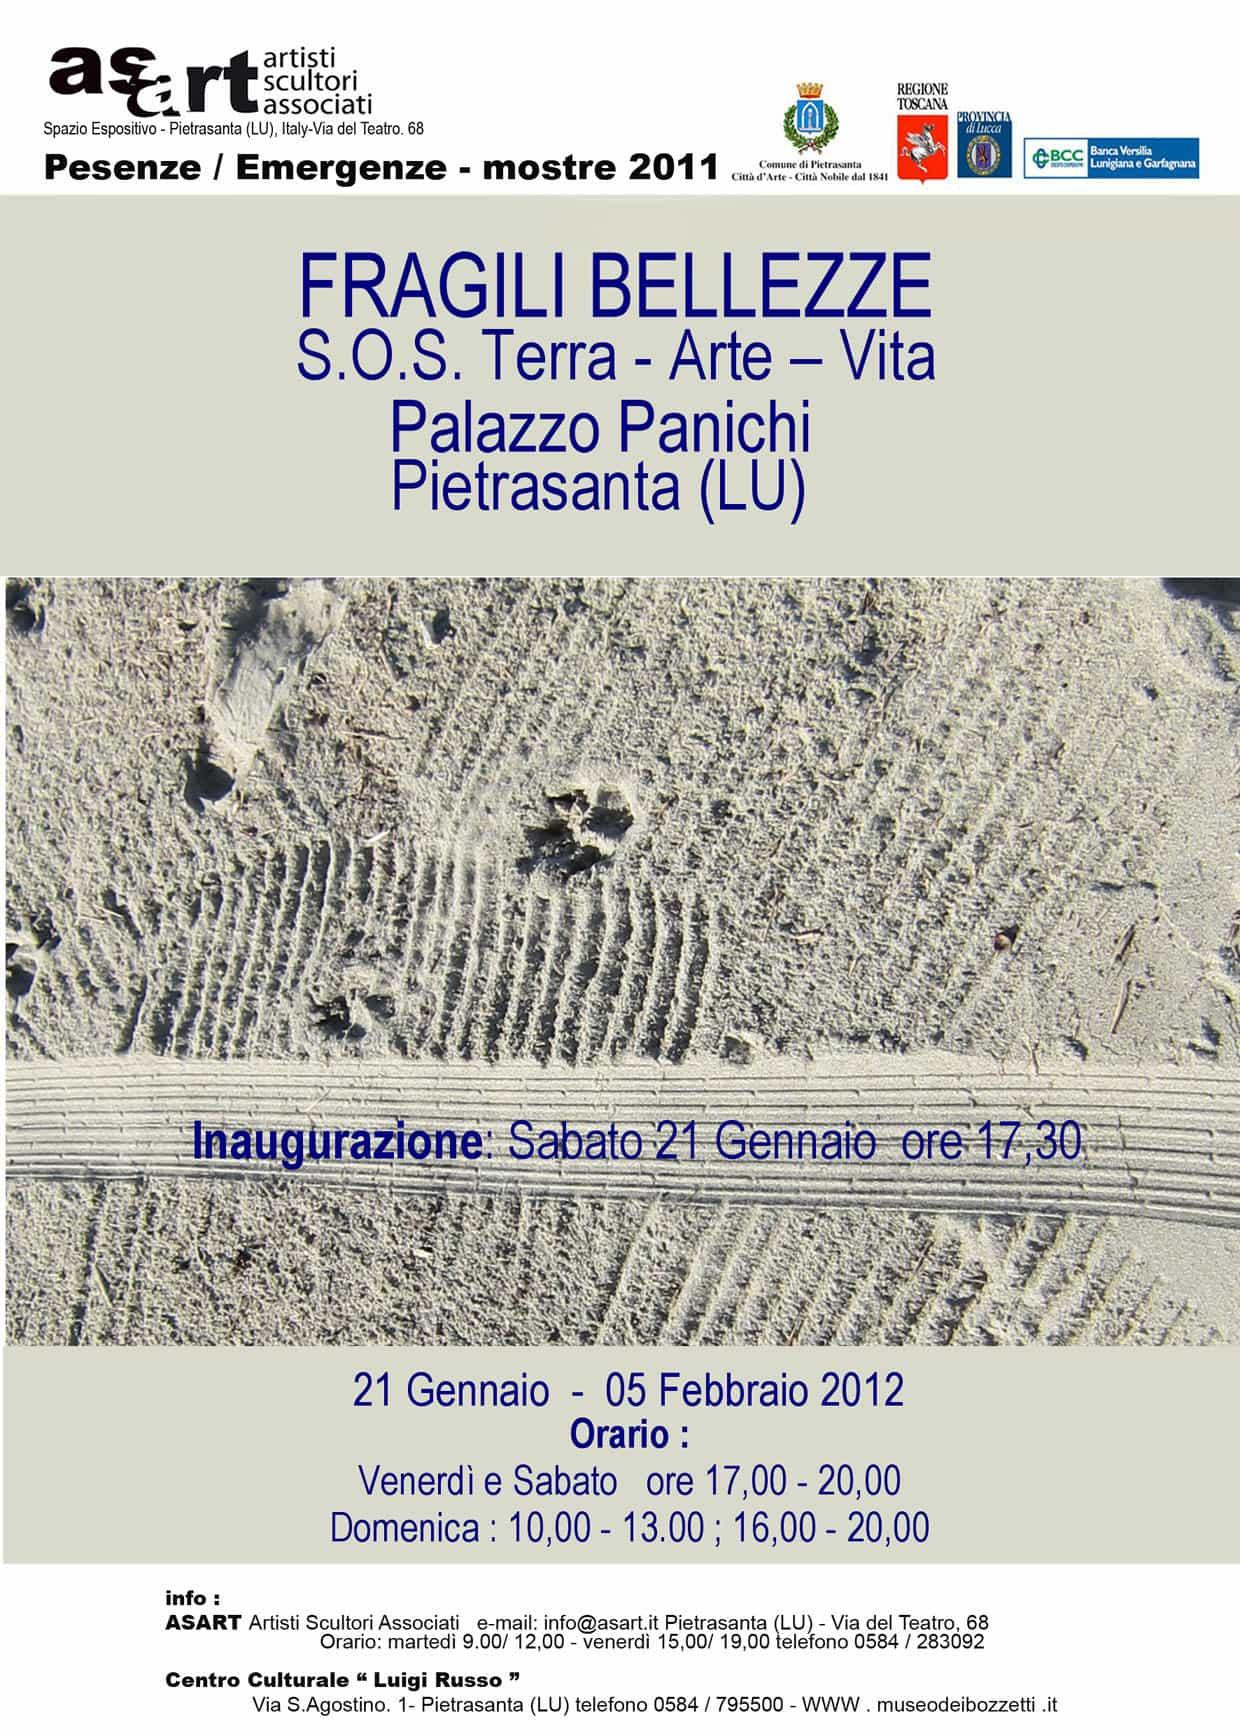 January - February 2012 | Fragile Beauties – SOS Earth, Art, Life | Group exhibition by Asart in Palazzo Panichi | Pietrasanta, Italy